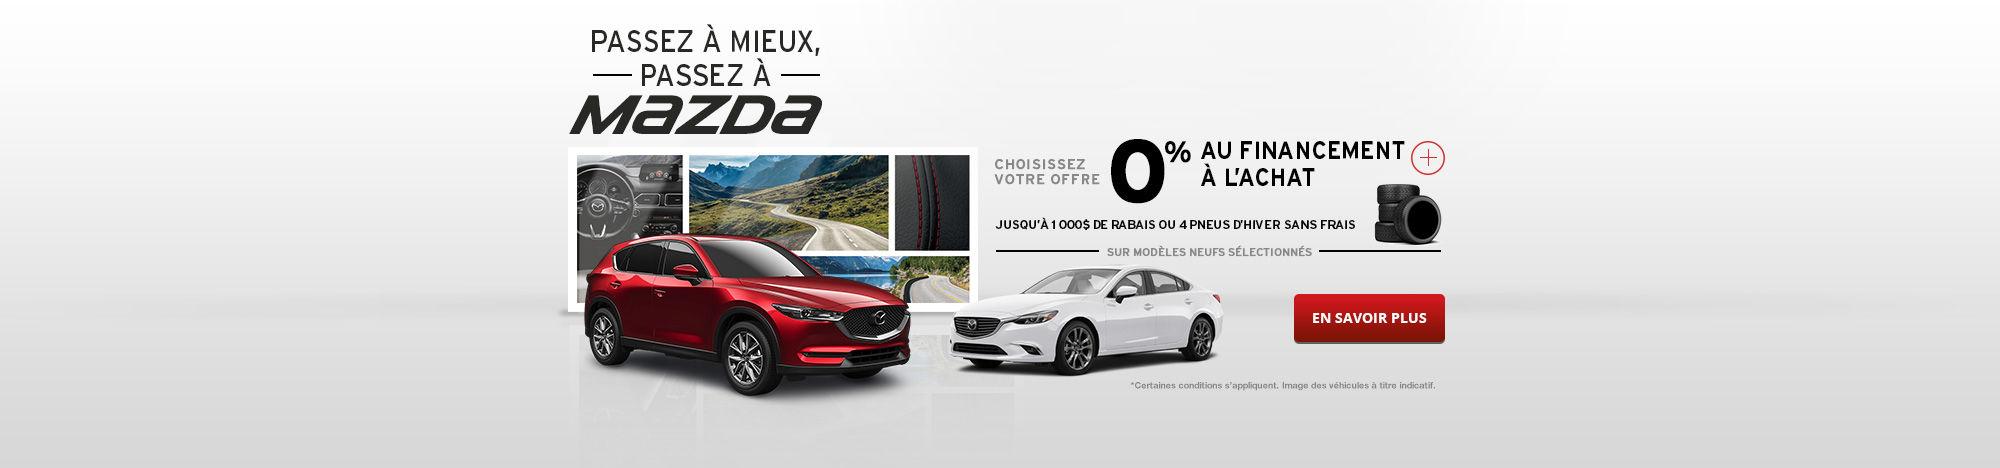 Passez à Mazda Septembre